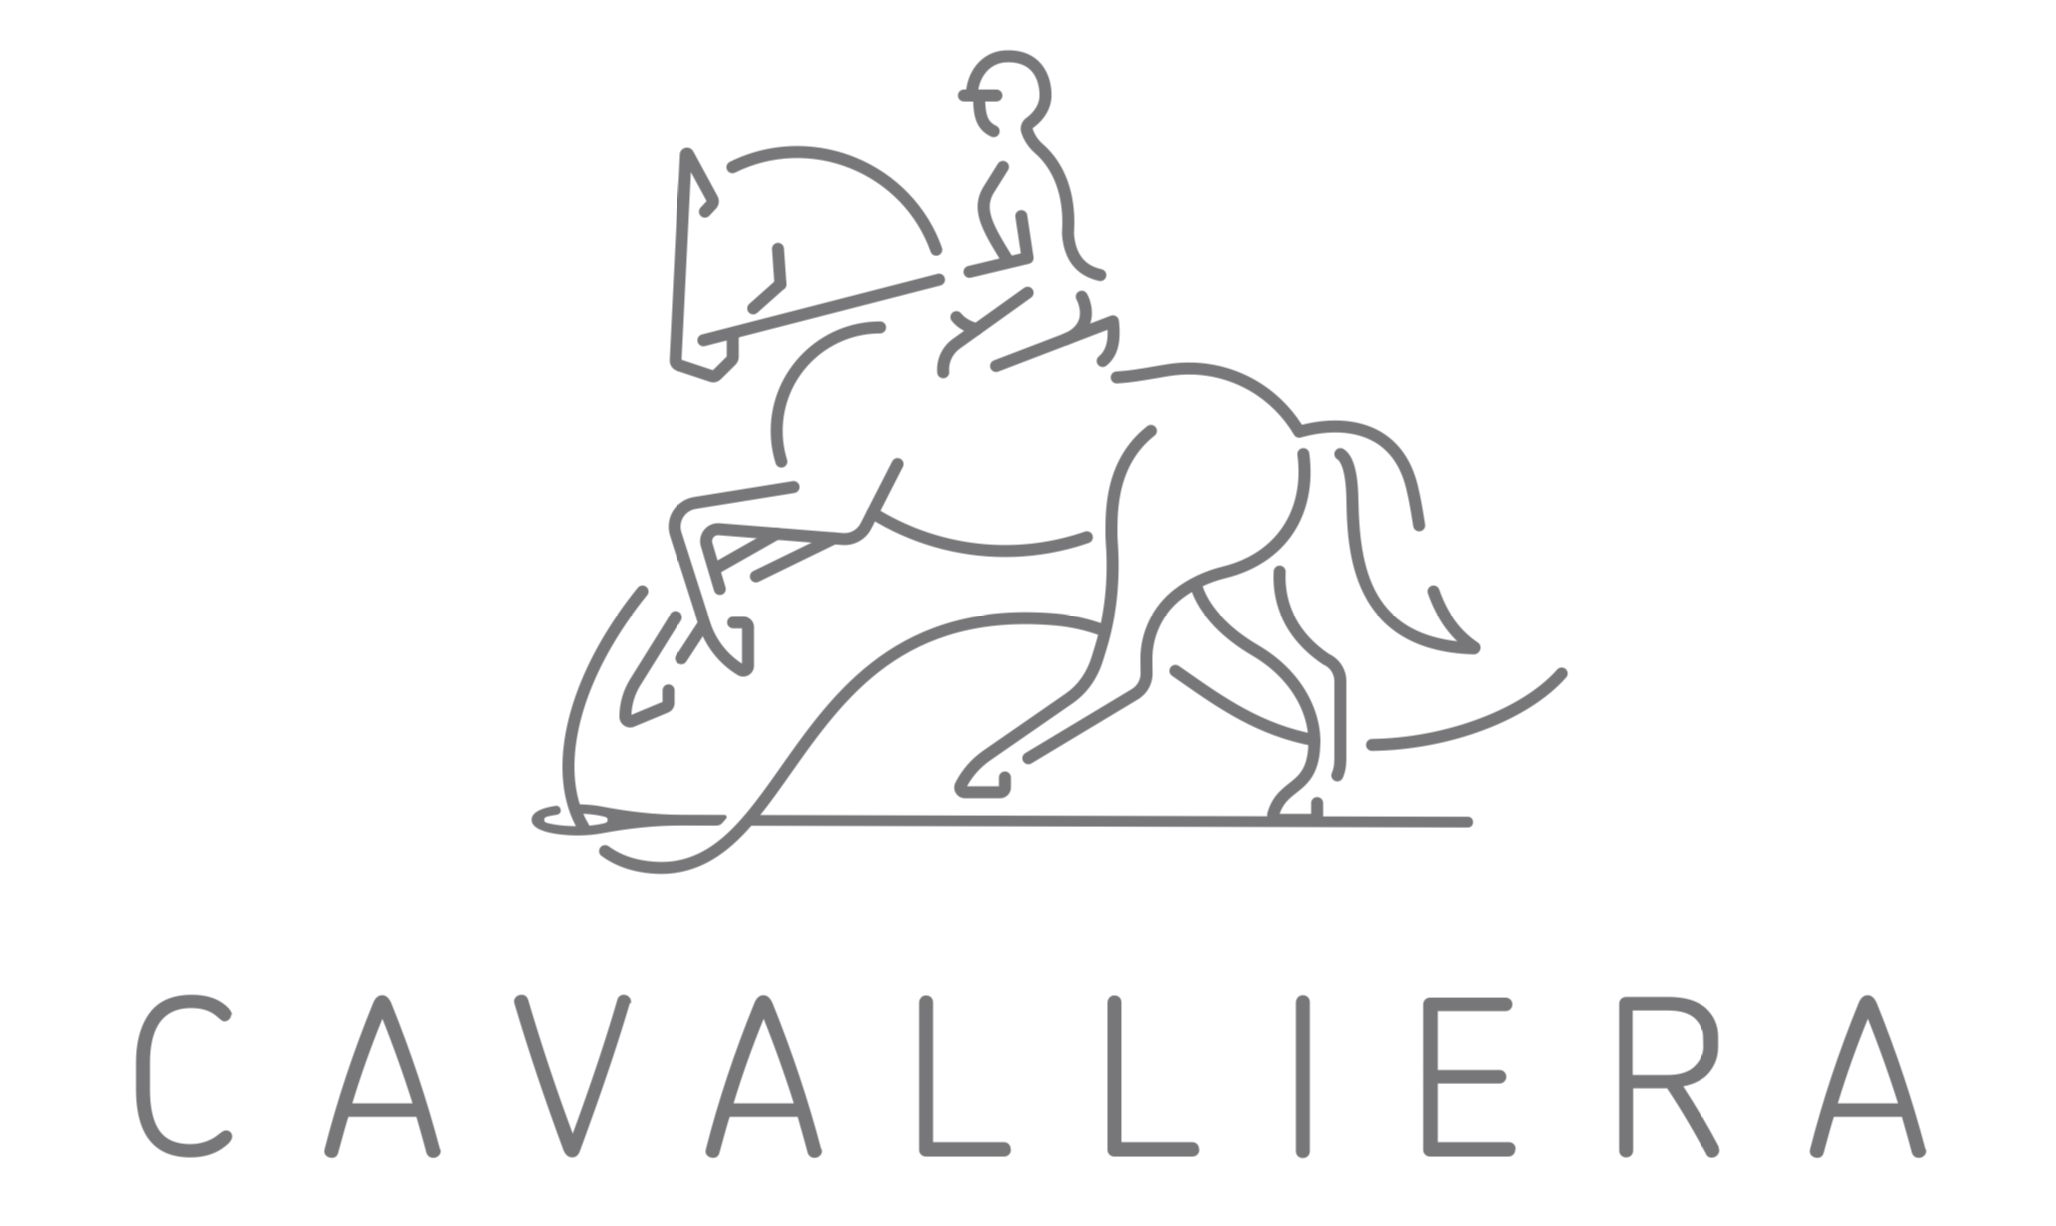 Cavalliera logo